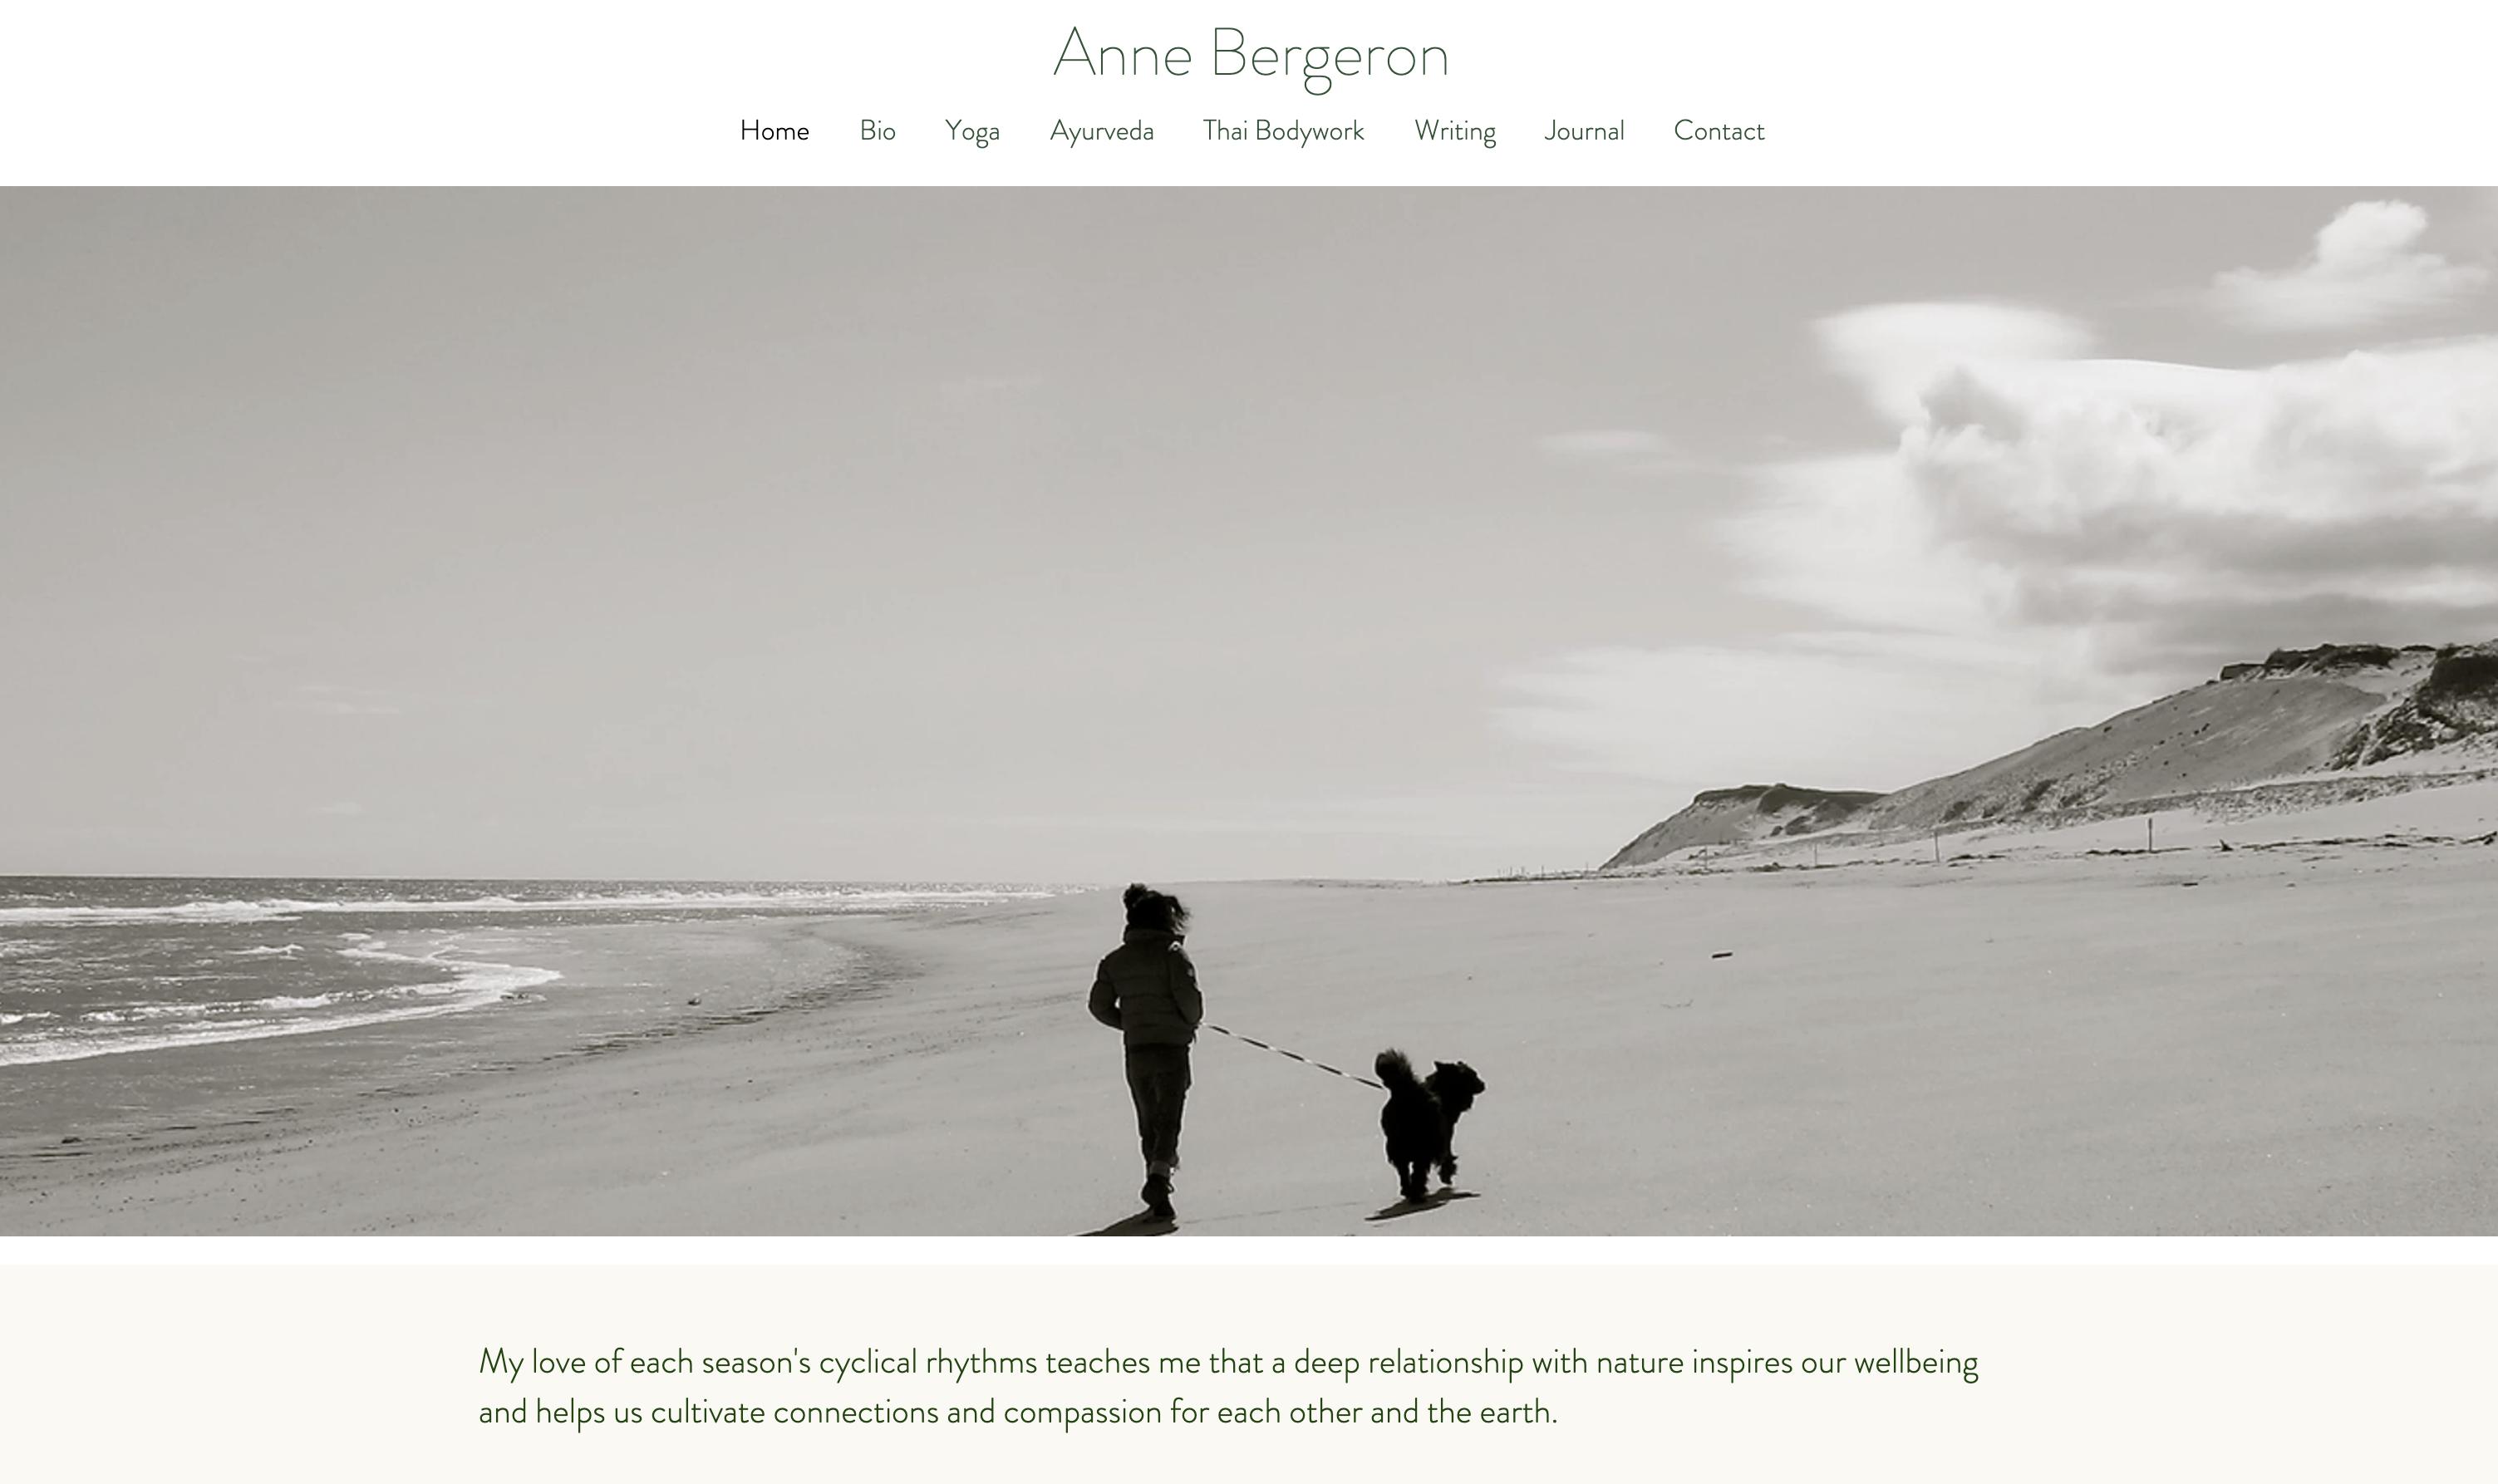 Anne Bergeron Yoga, Thai Massage, Ayurvedic Practitioner, and Wr...